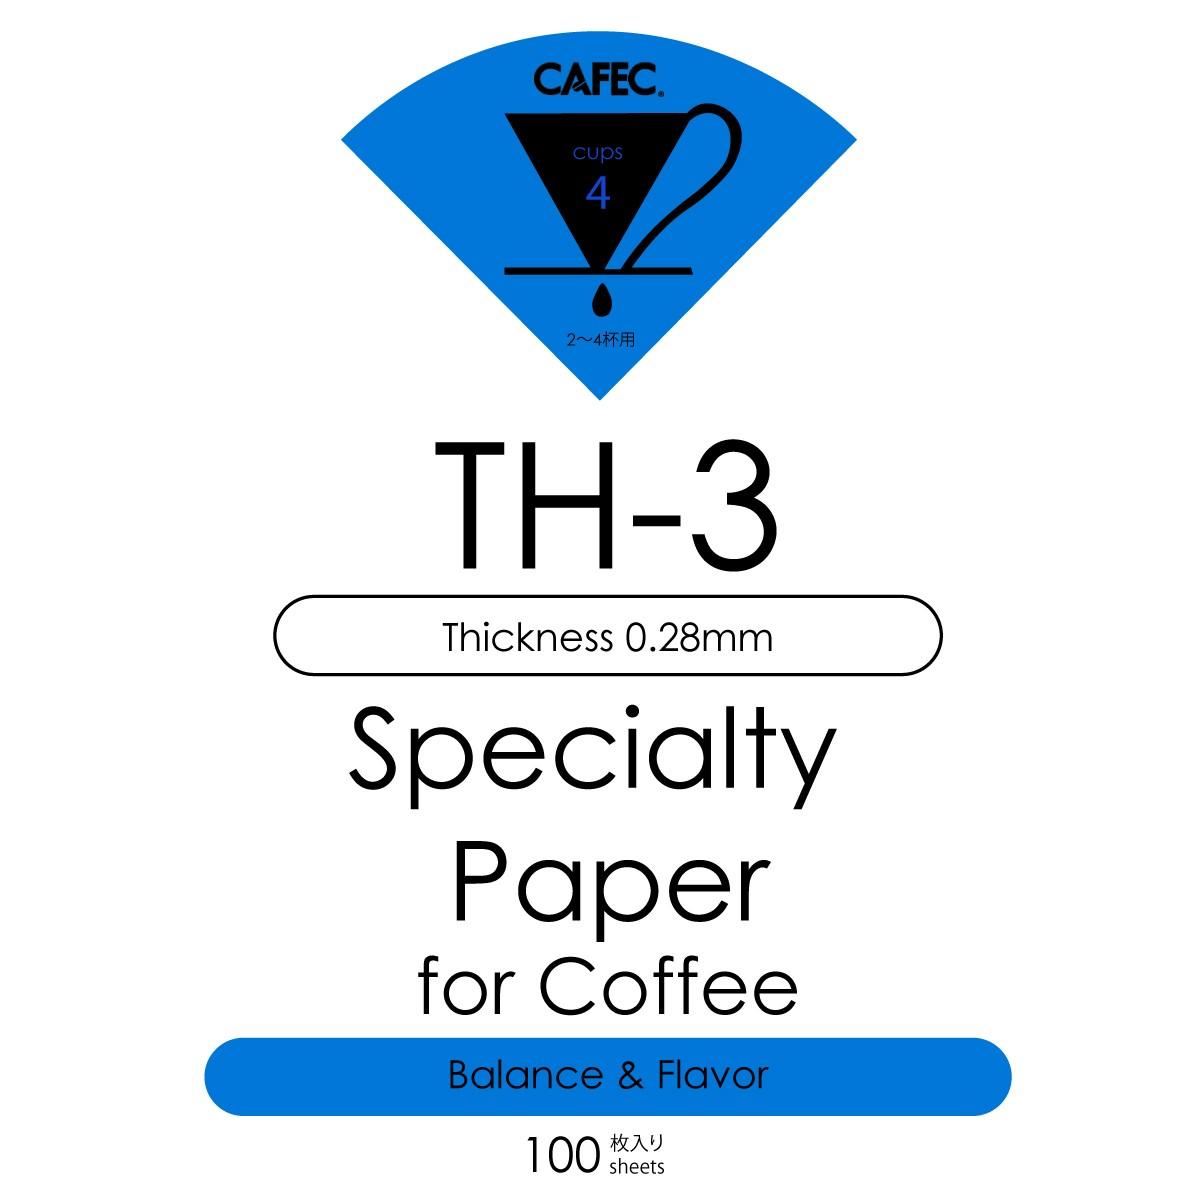 CAFEC TH-3